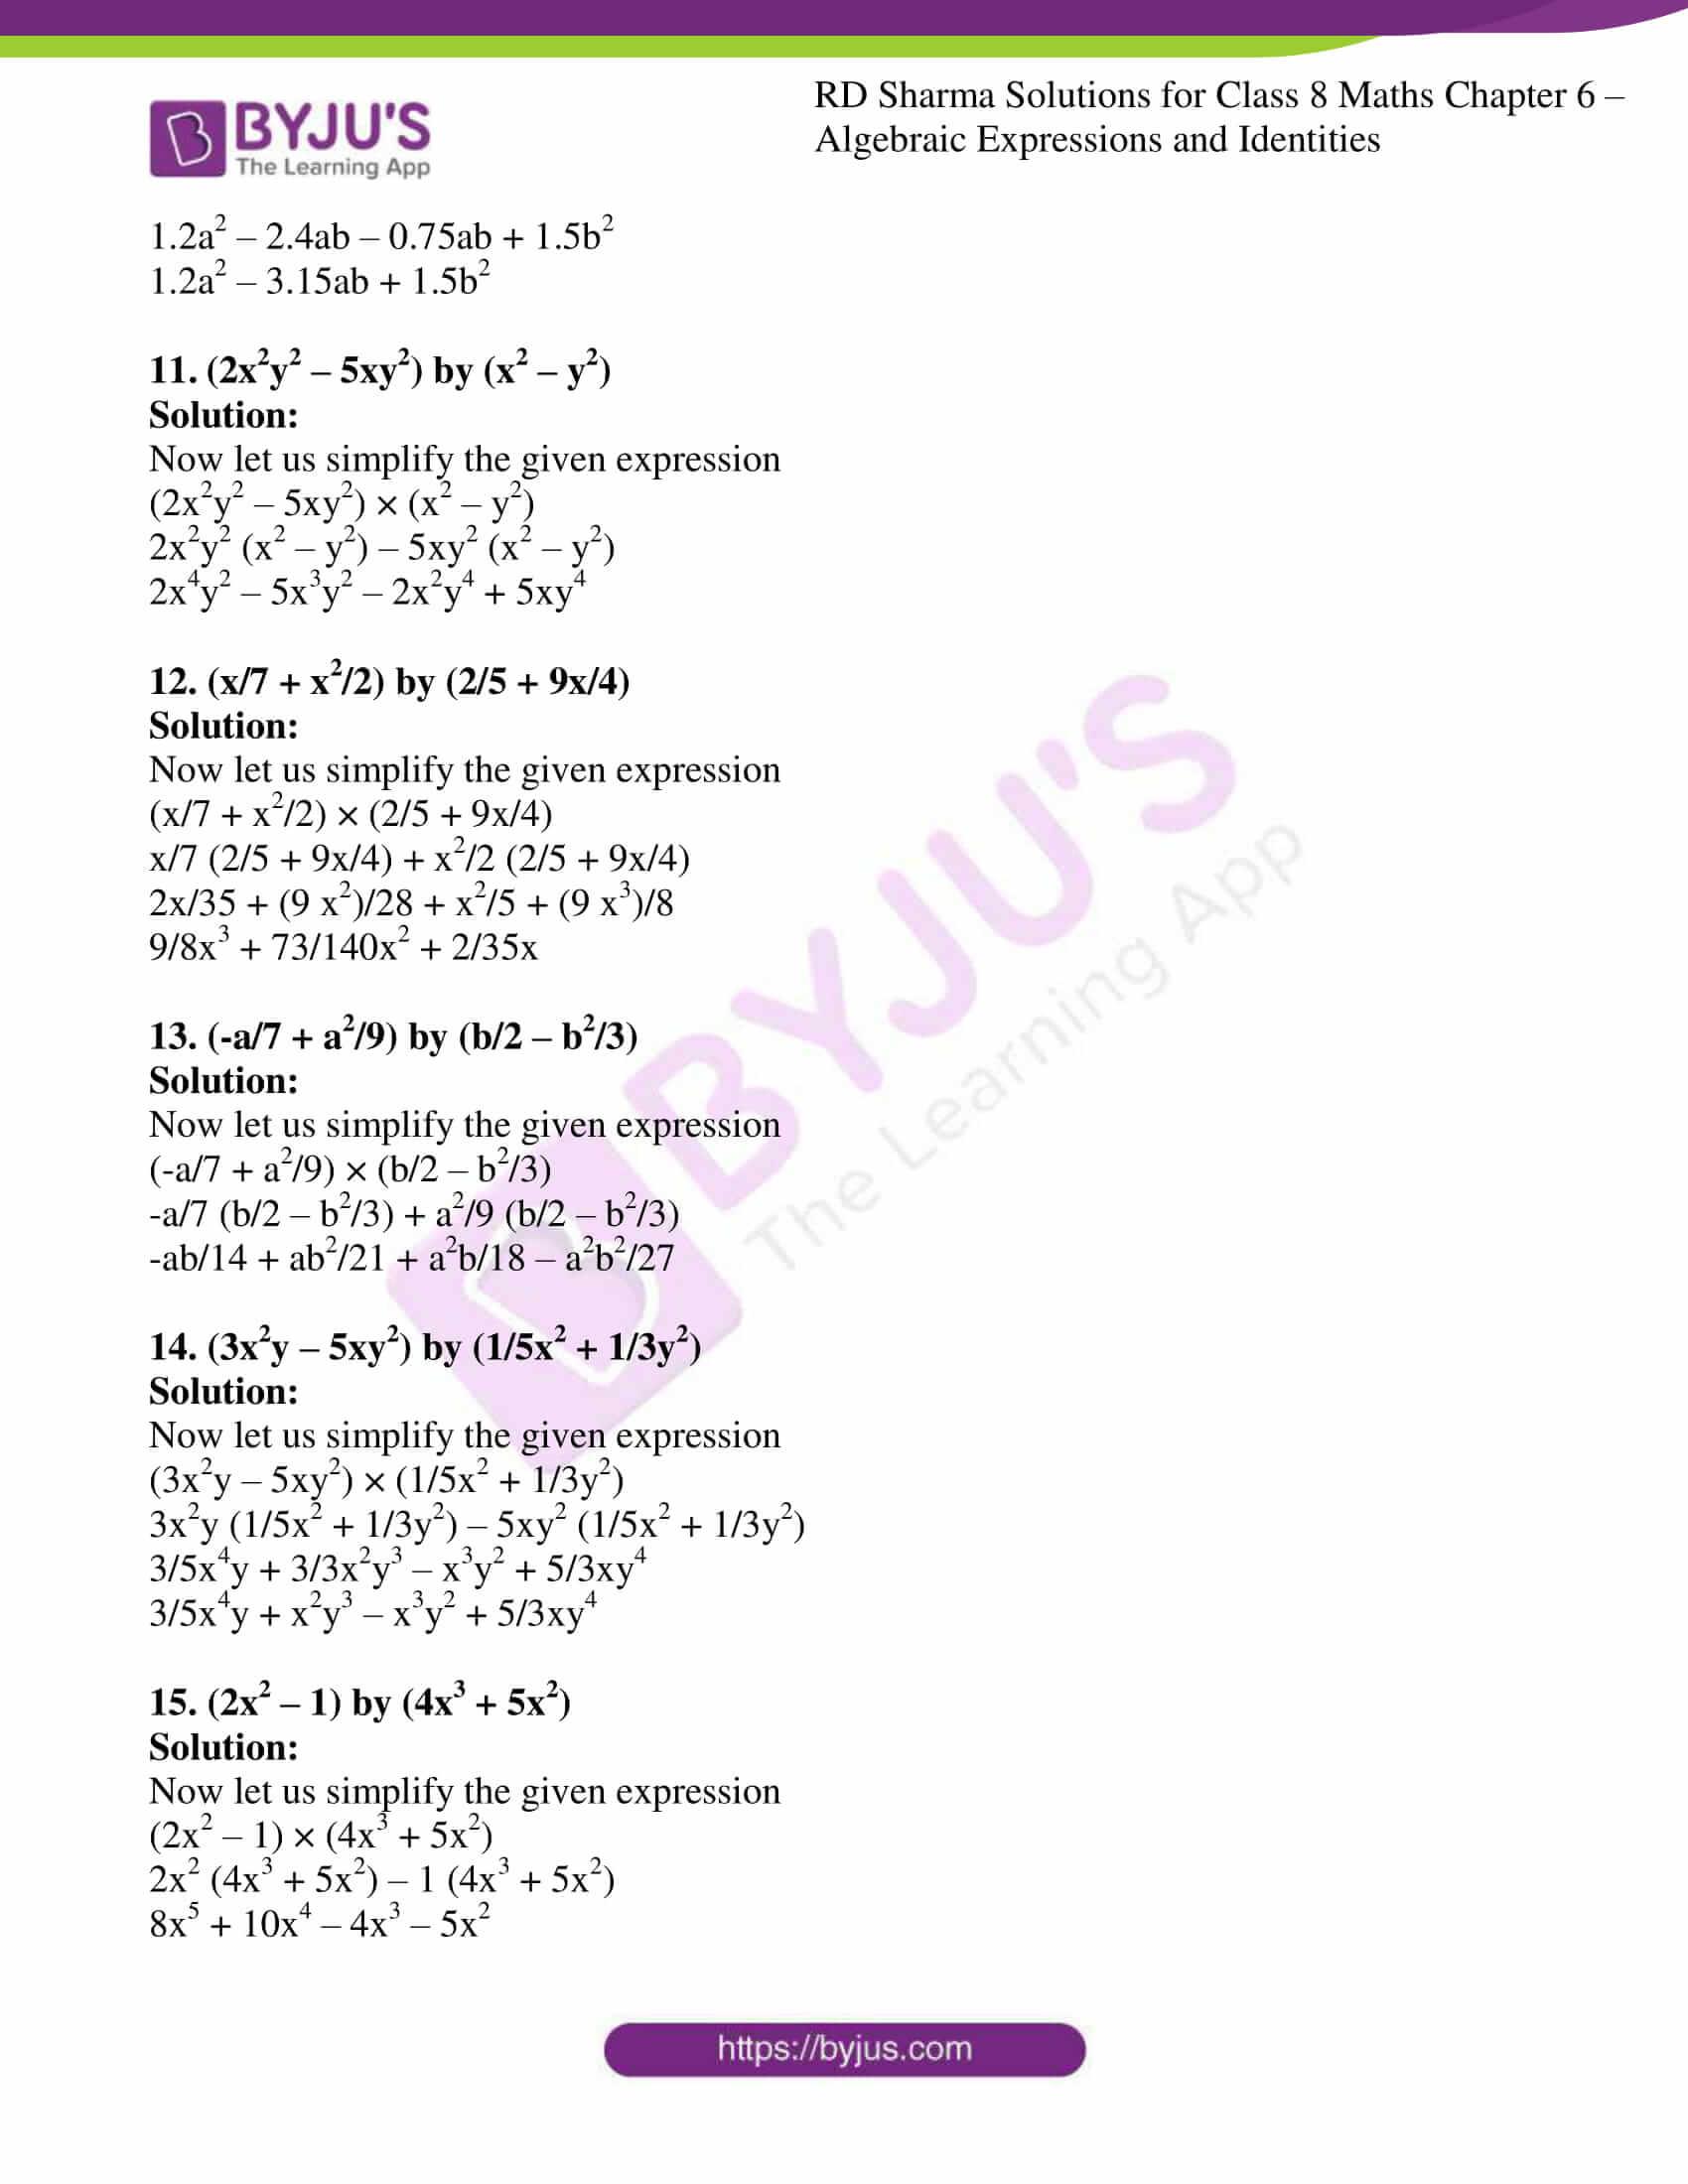 rd sharma class 8 maths chapter 6 exercise 5 3